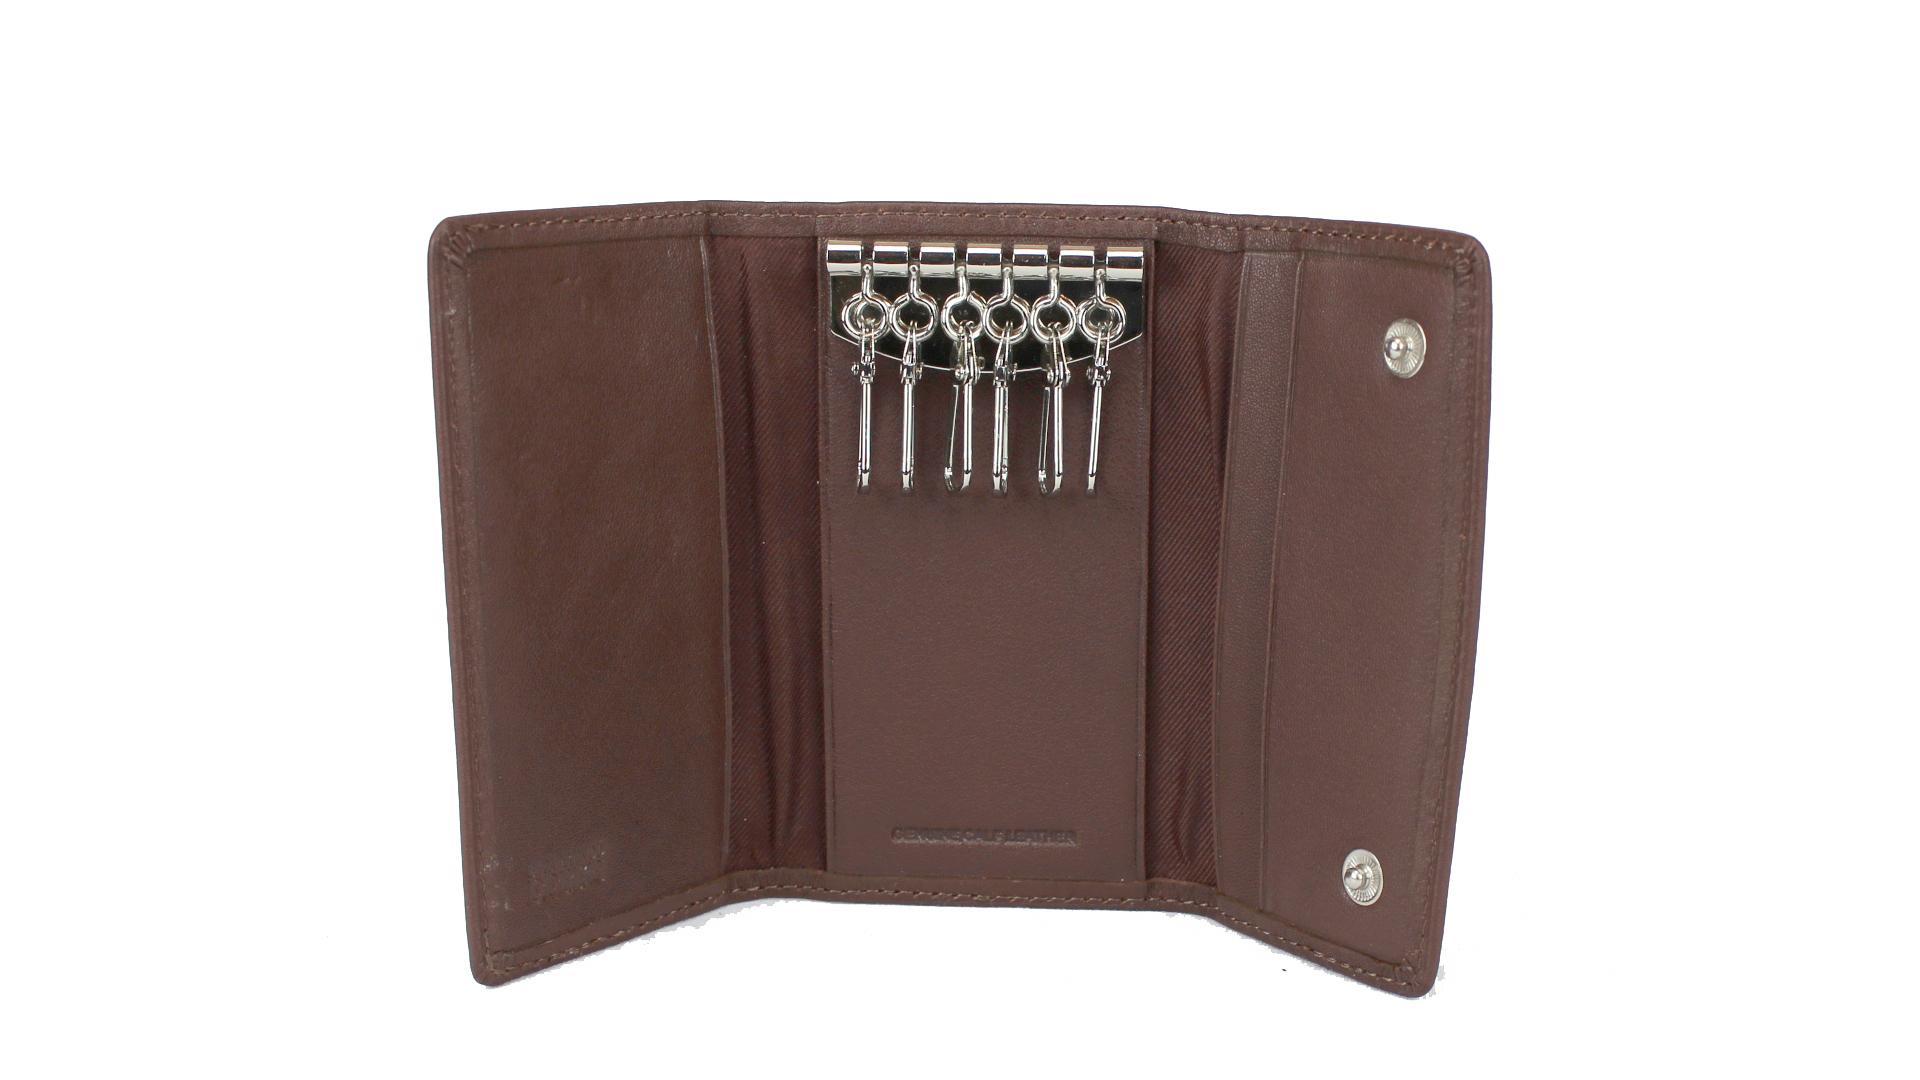 Keys holder  Gianfranco Ferrè  021 024 001 007 Castagna